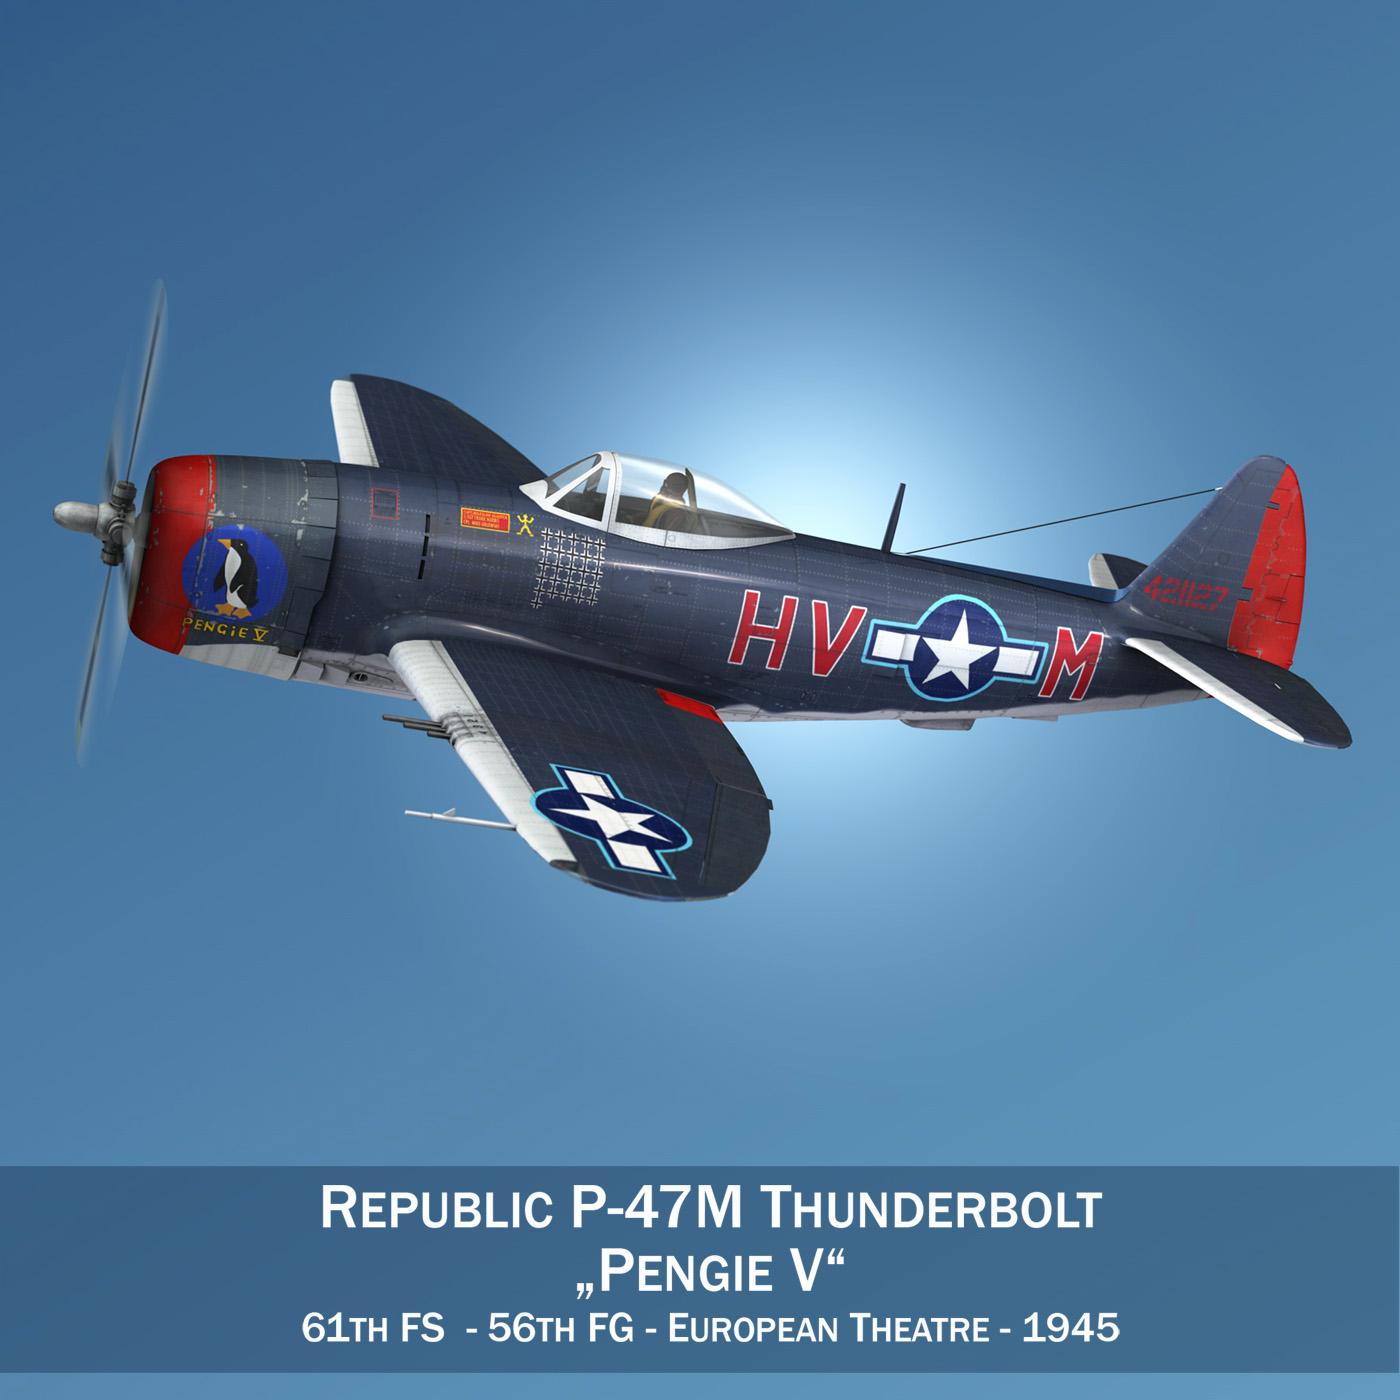 Republic P-47M Thunderbolt - Pengie V 3d model  279714